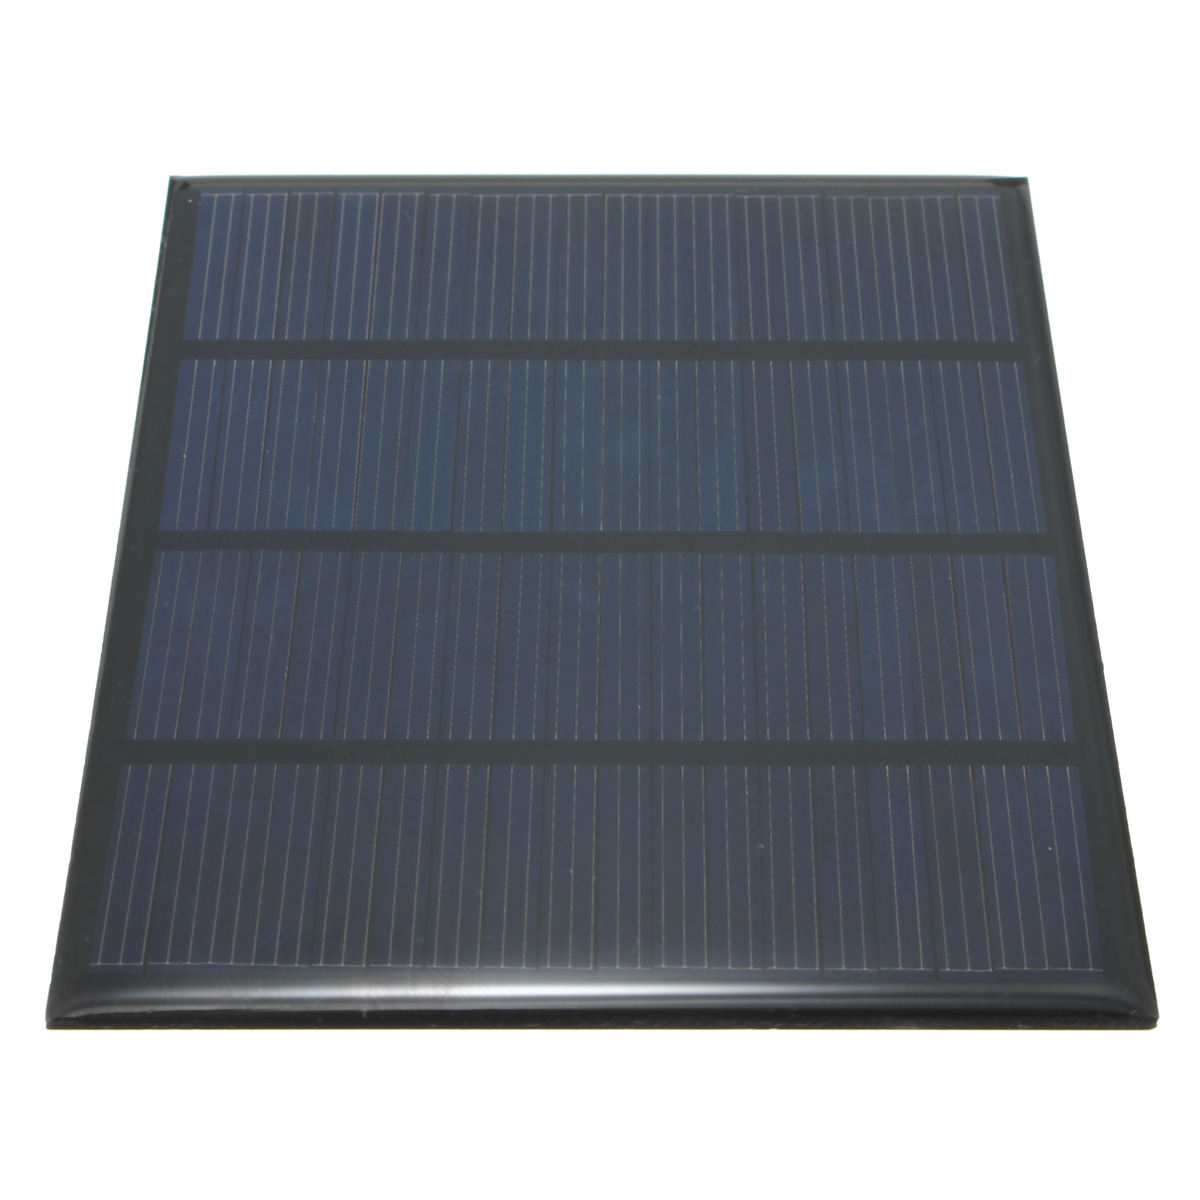 Excellent quality 12V 1.5W Epoxy Solar Panels Mini Solar Cells Polycrystalline Silicon Solar DIY Solar Module(China (Mainland))